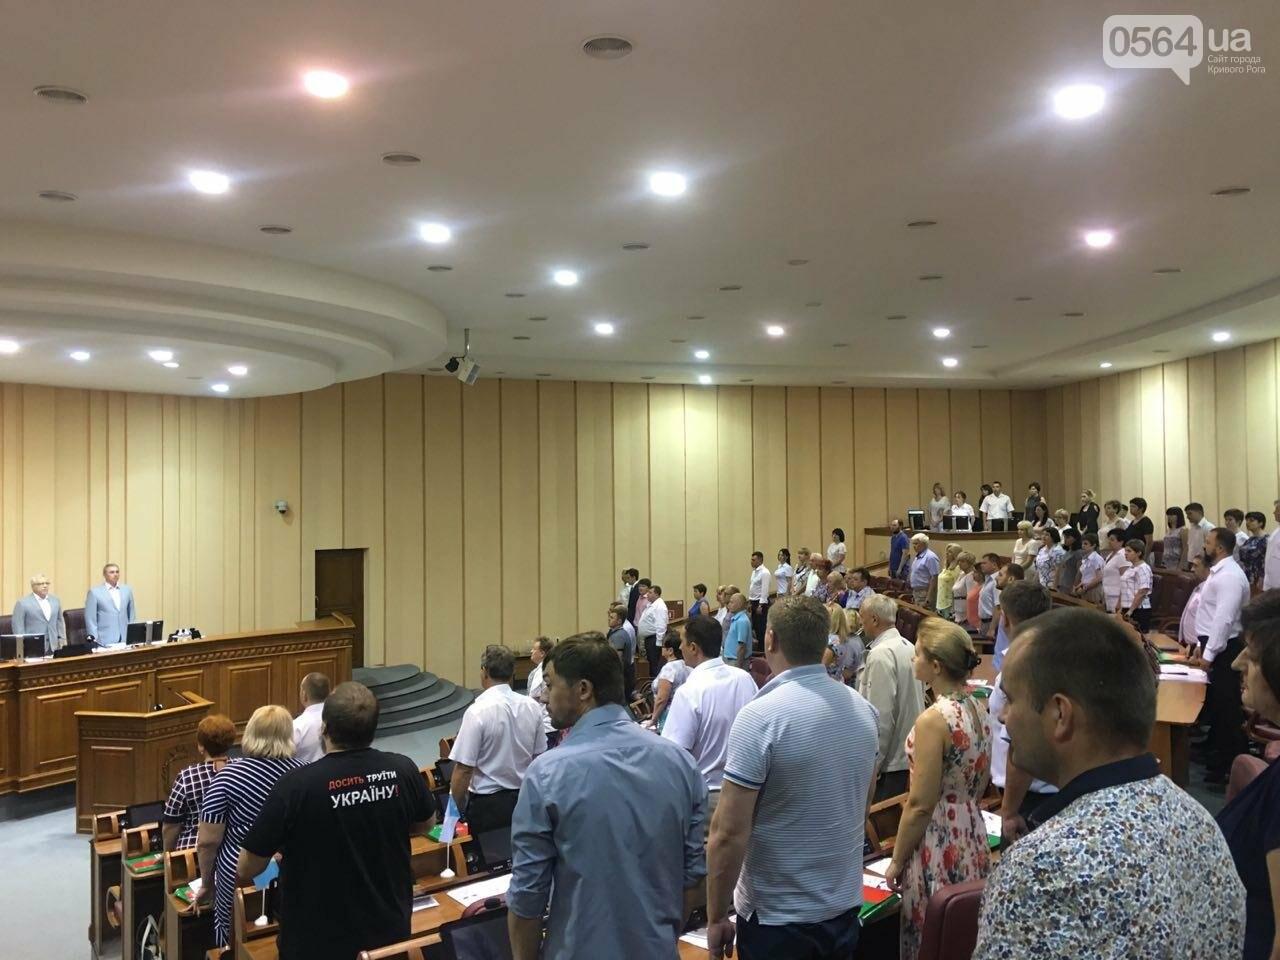 Криворожский горсовет не поддержал петицию о запрете Марша равенства, - ФОТО, фото-14